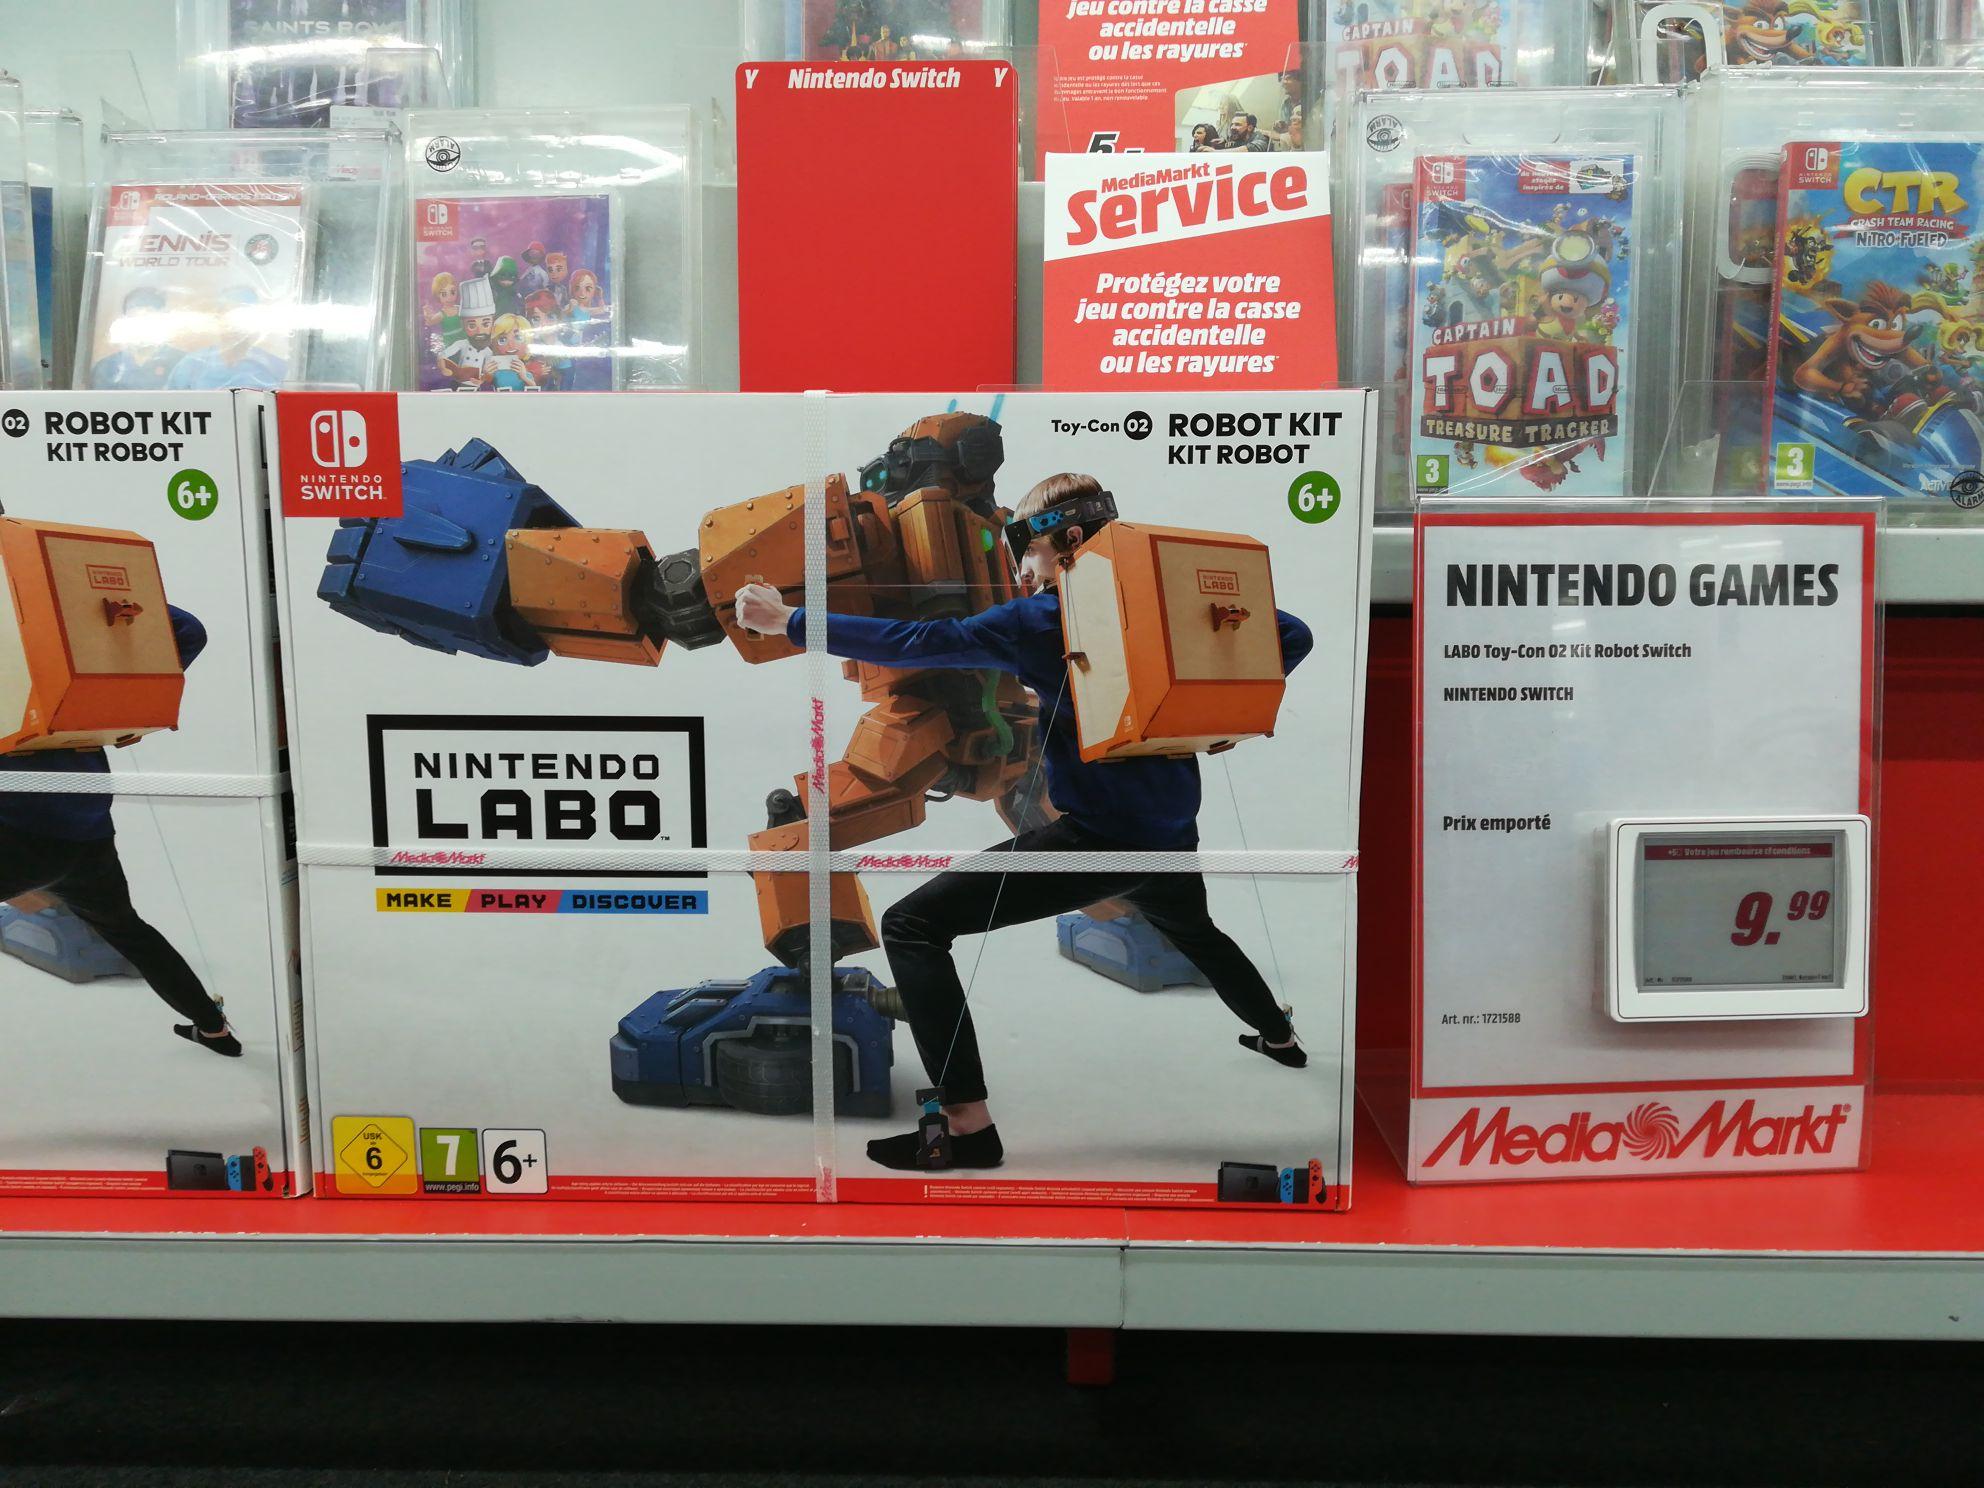 Nintendo LABO Toy-Con 02 Kit Robot sur Nintendo Switch (Frontaliers Belgique)